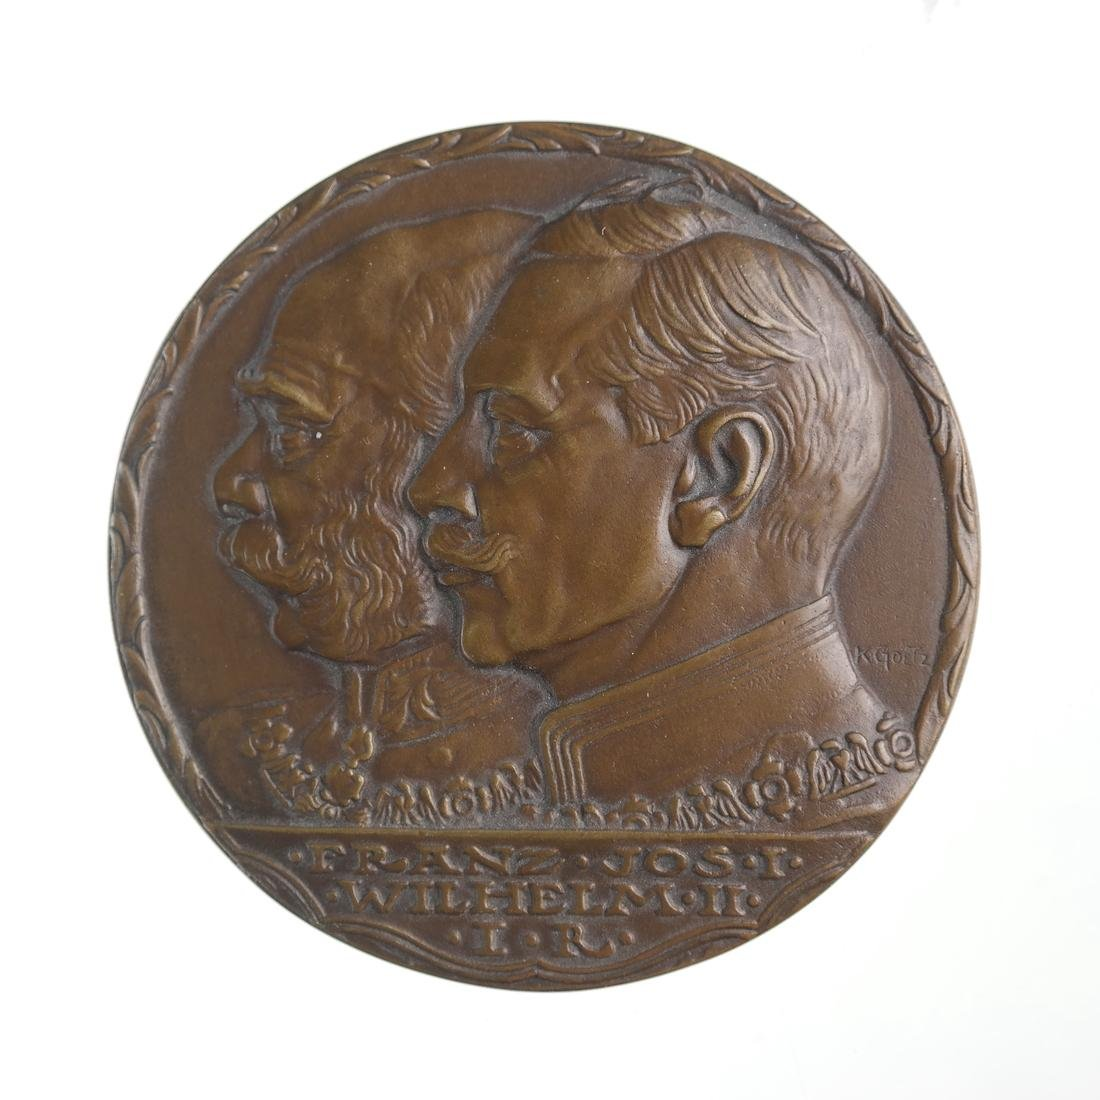 GERMANY. AUSTRO-GERMAN ALLIANCE MEDAL, 1914.